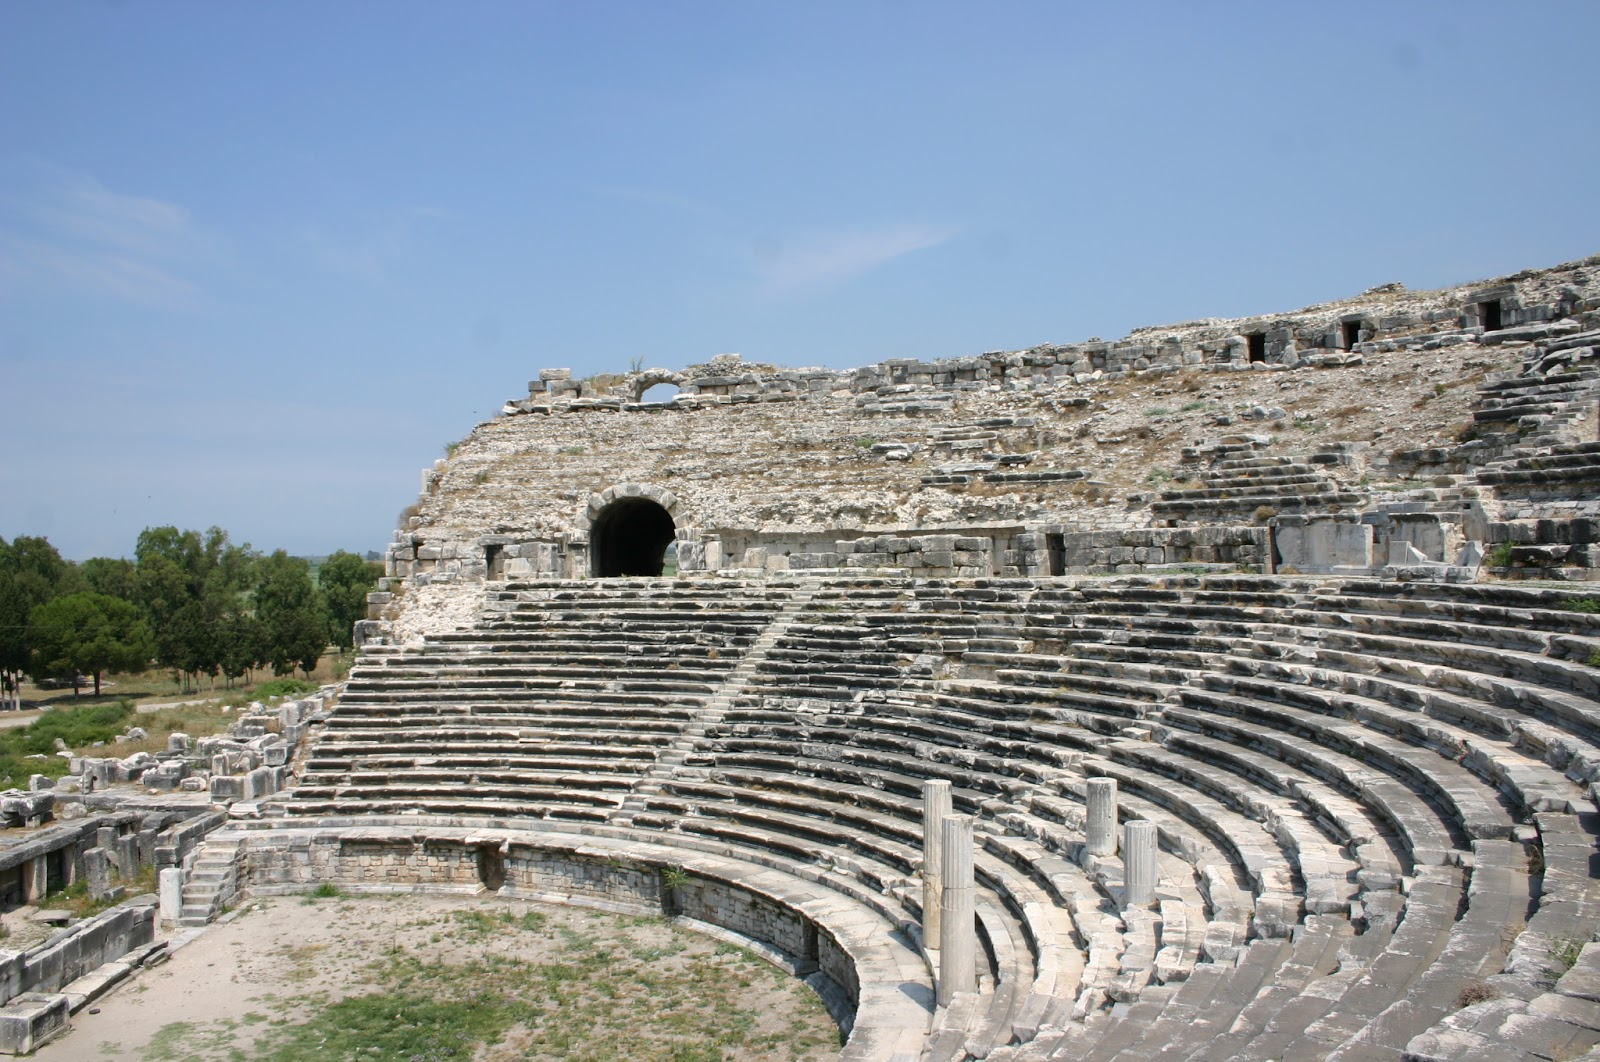 Green Espirit: Mediterranean Cruise - Turkey, Didyma, Miletus